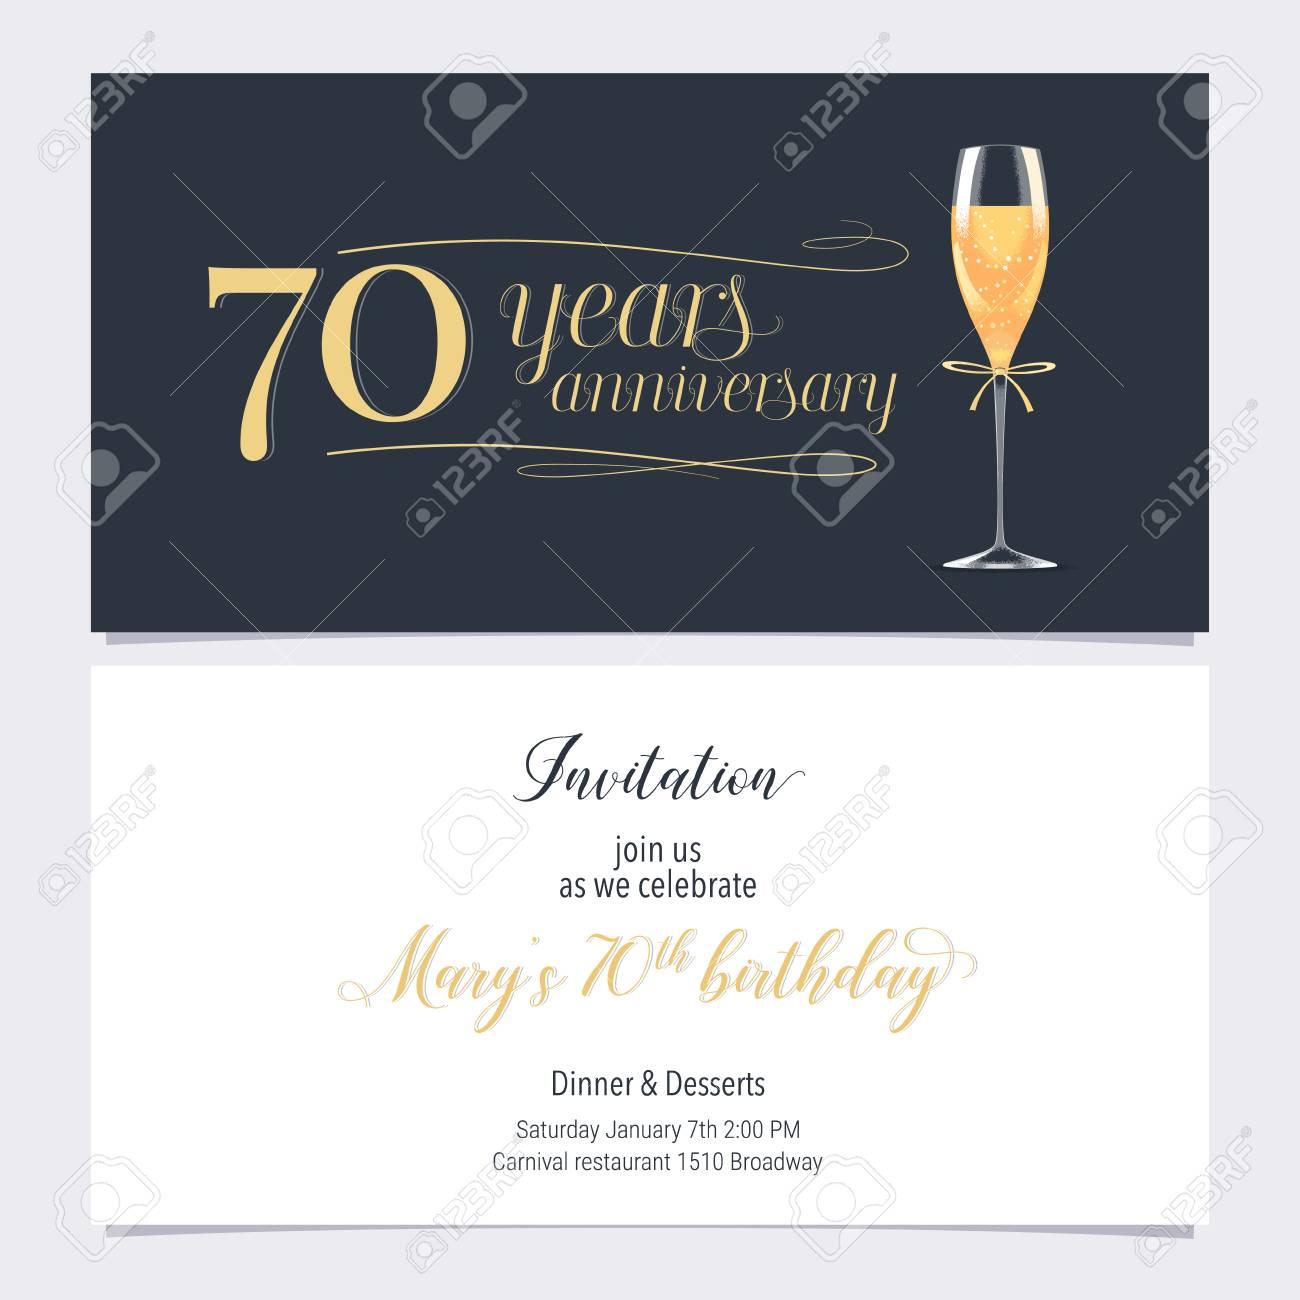 70 years anniversary invitation illustration graphic design